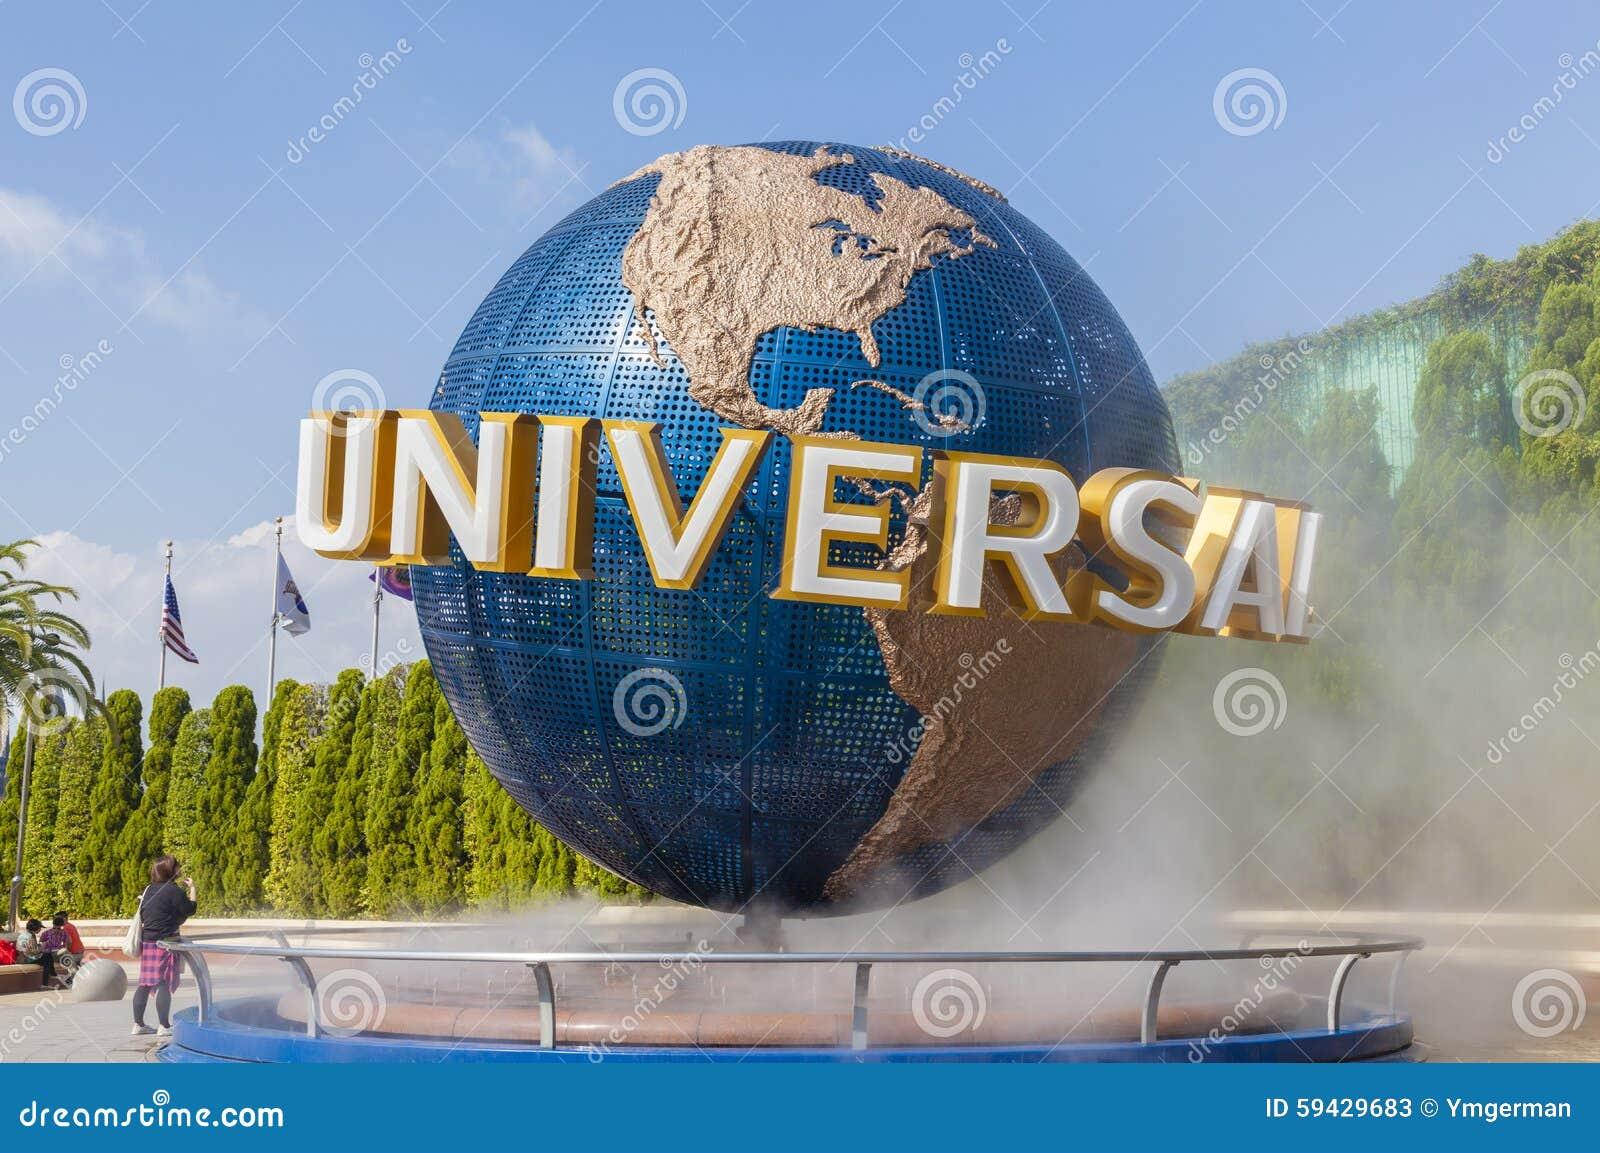 Universal Studios In Osaka, Japan Editorial Stock Photo